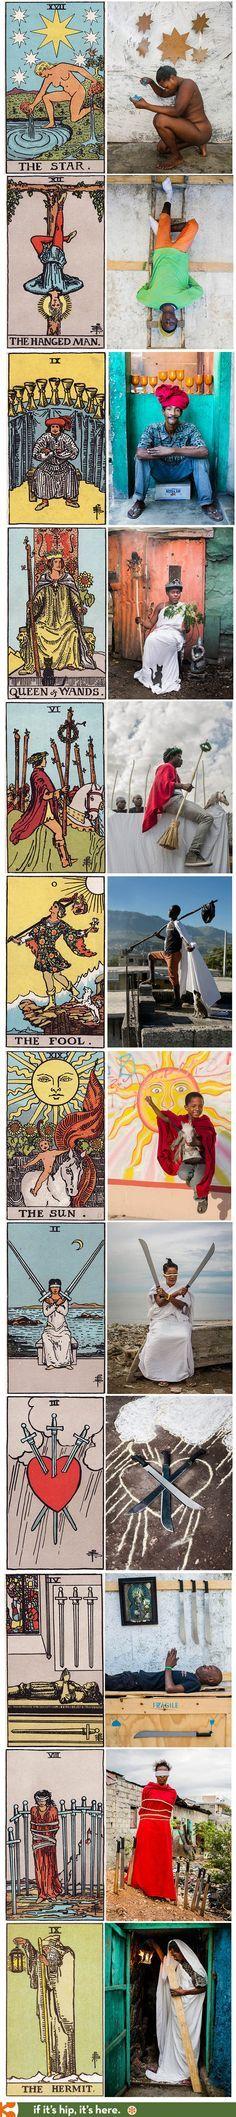 Releitura das cartas de Tarot feita pelas fotógrafas Alice Smeets e Atis Rezistans no Haiti.